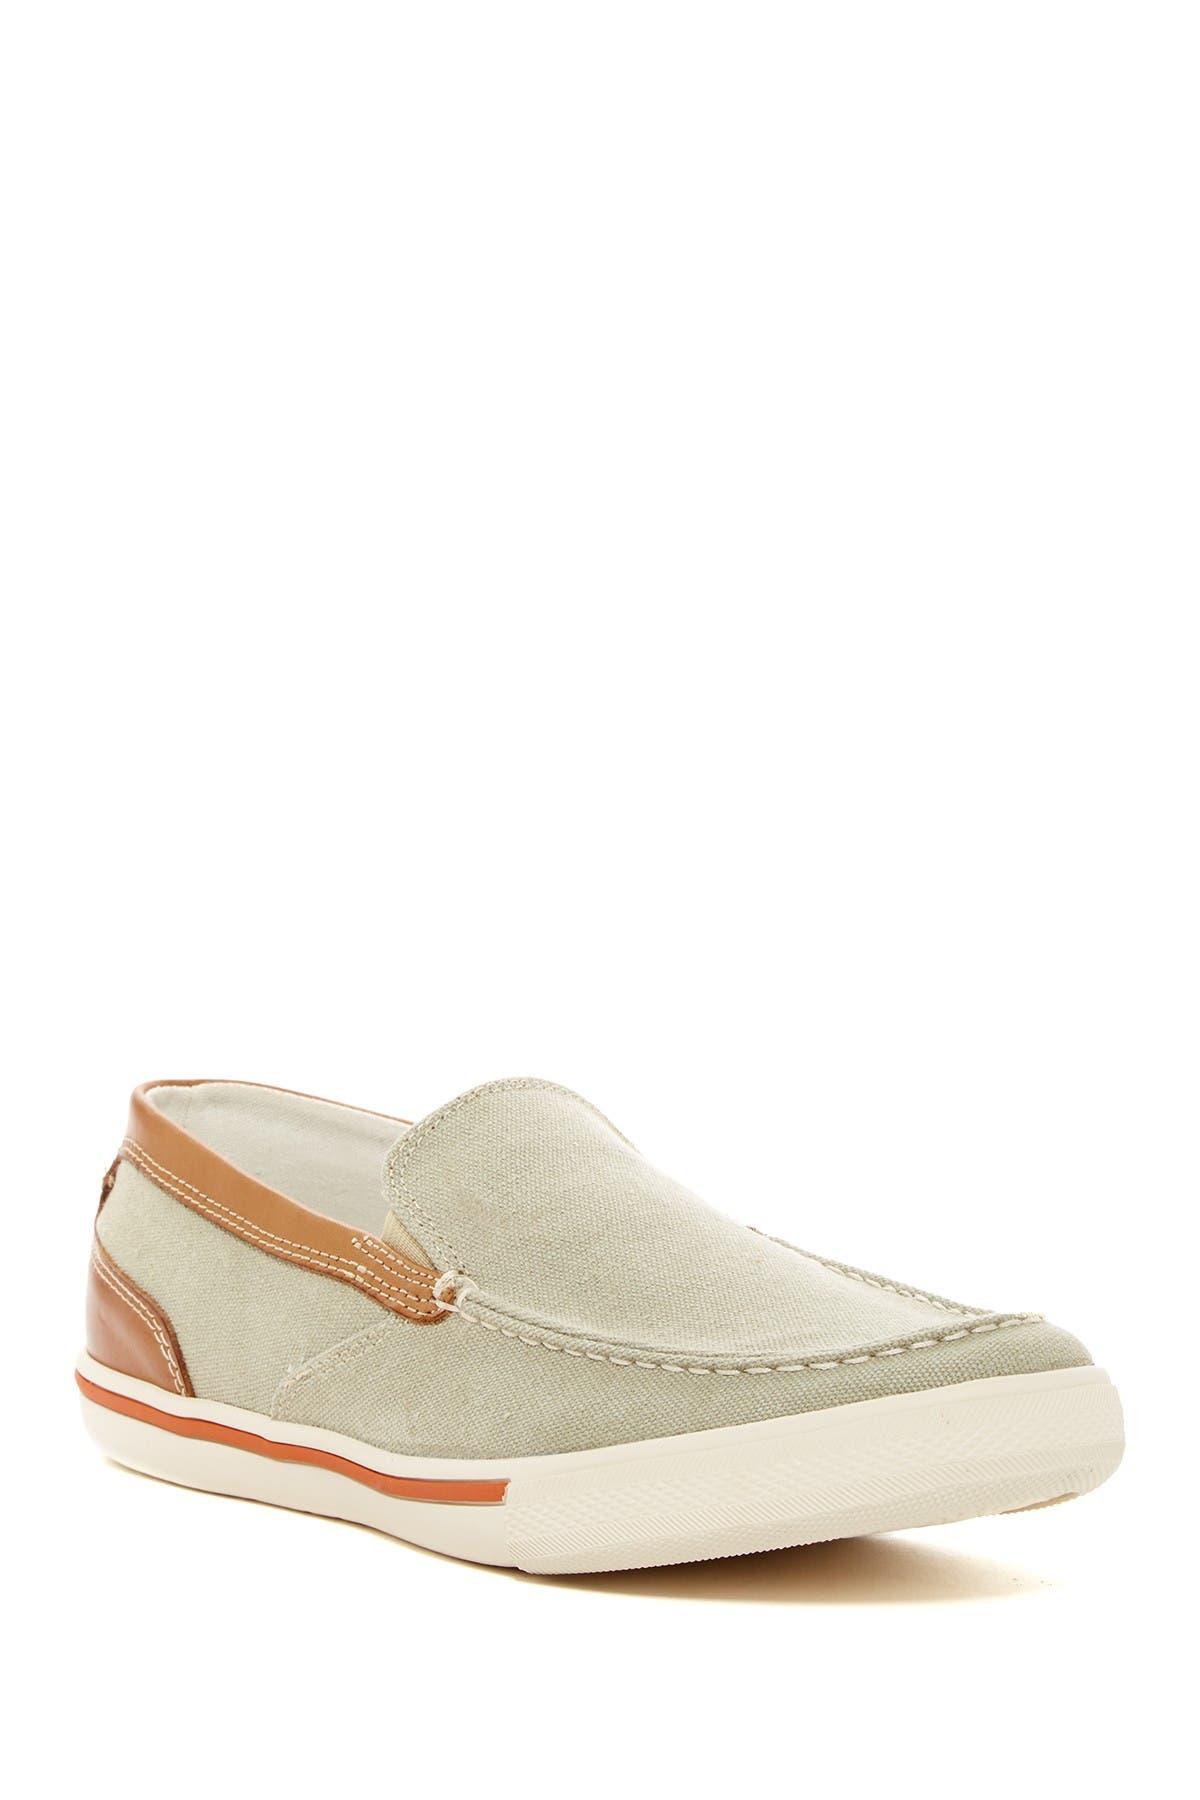 Image of Tommy Bahama Costa Venetian Slip-On Sneaker